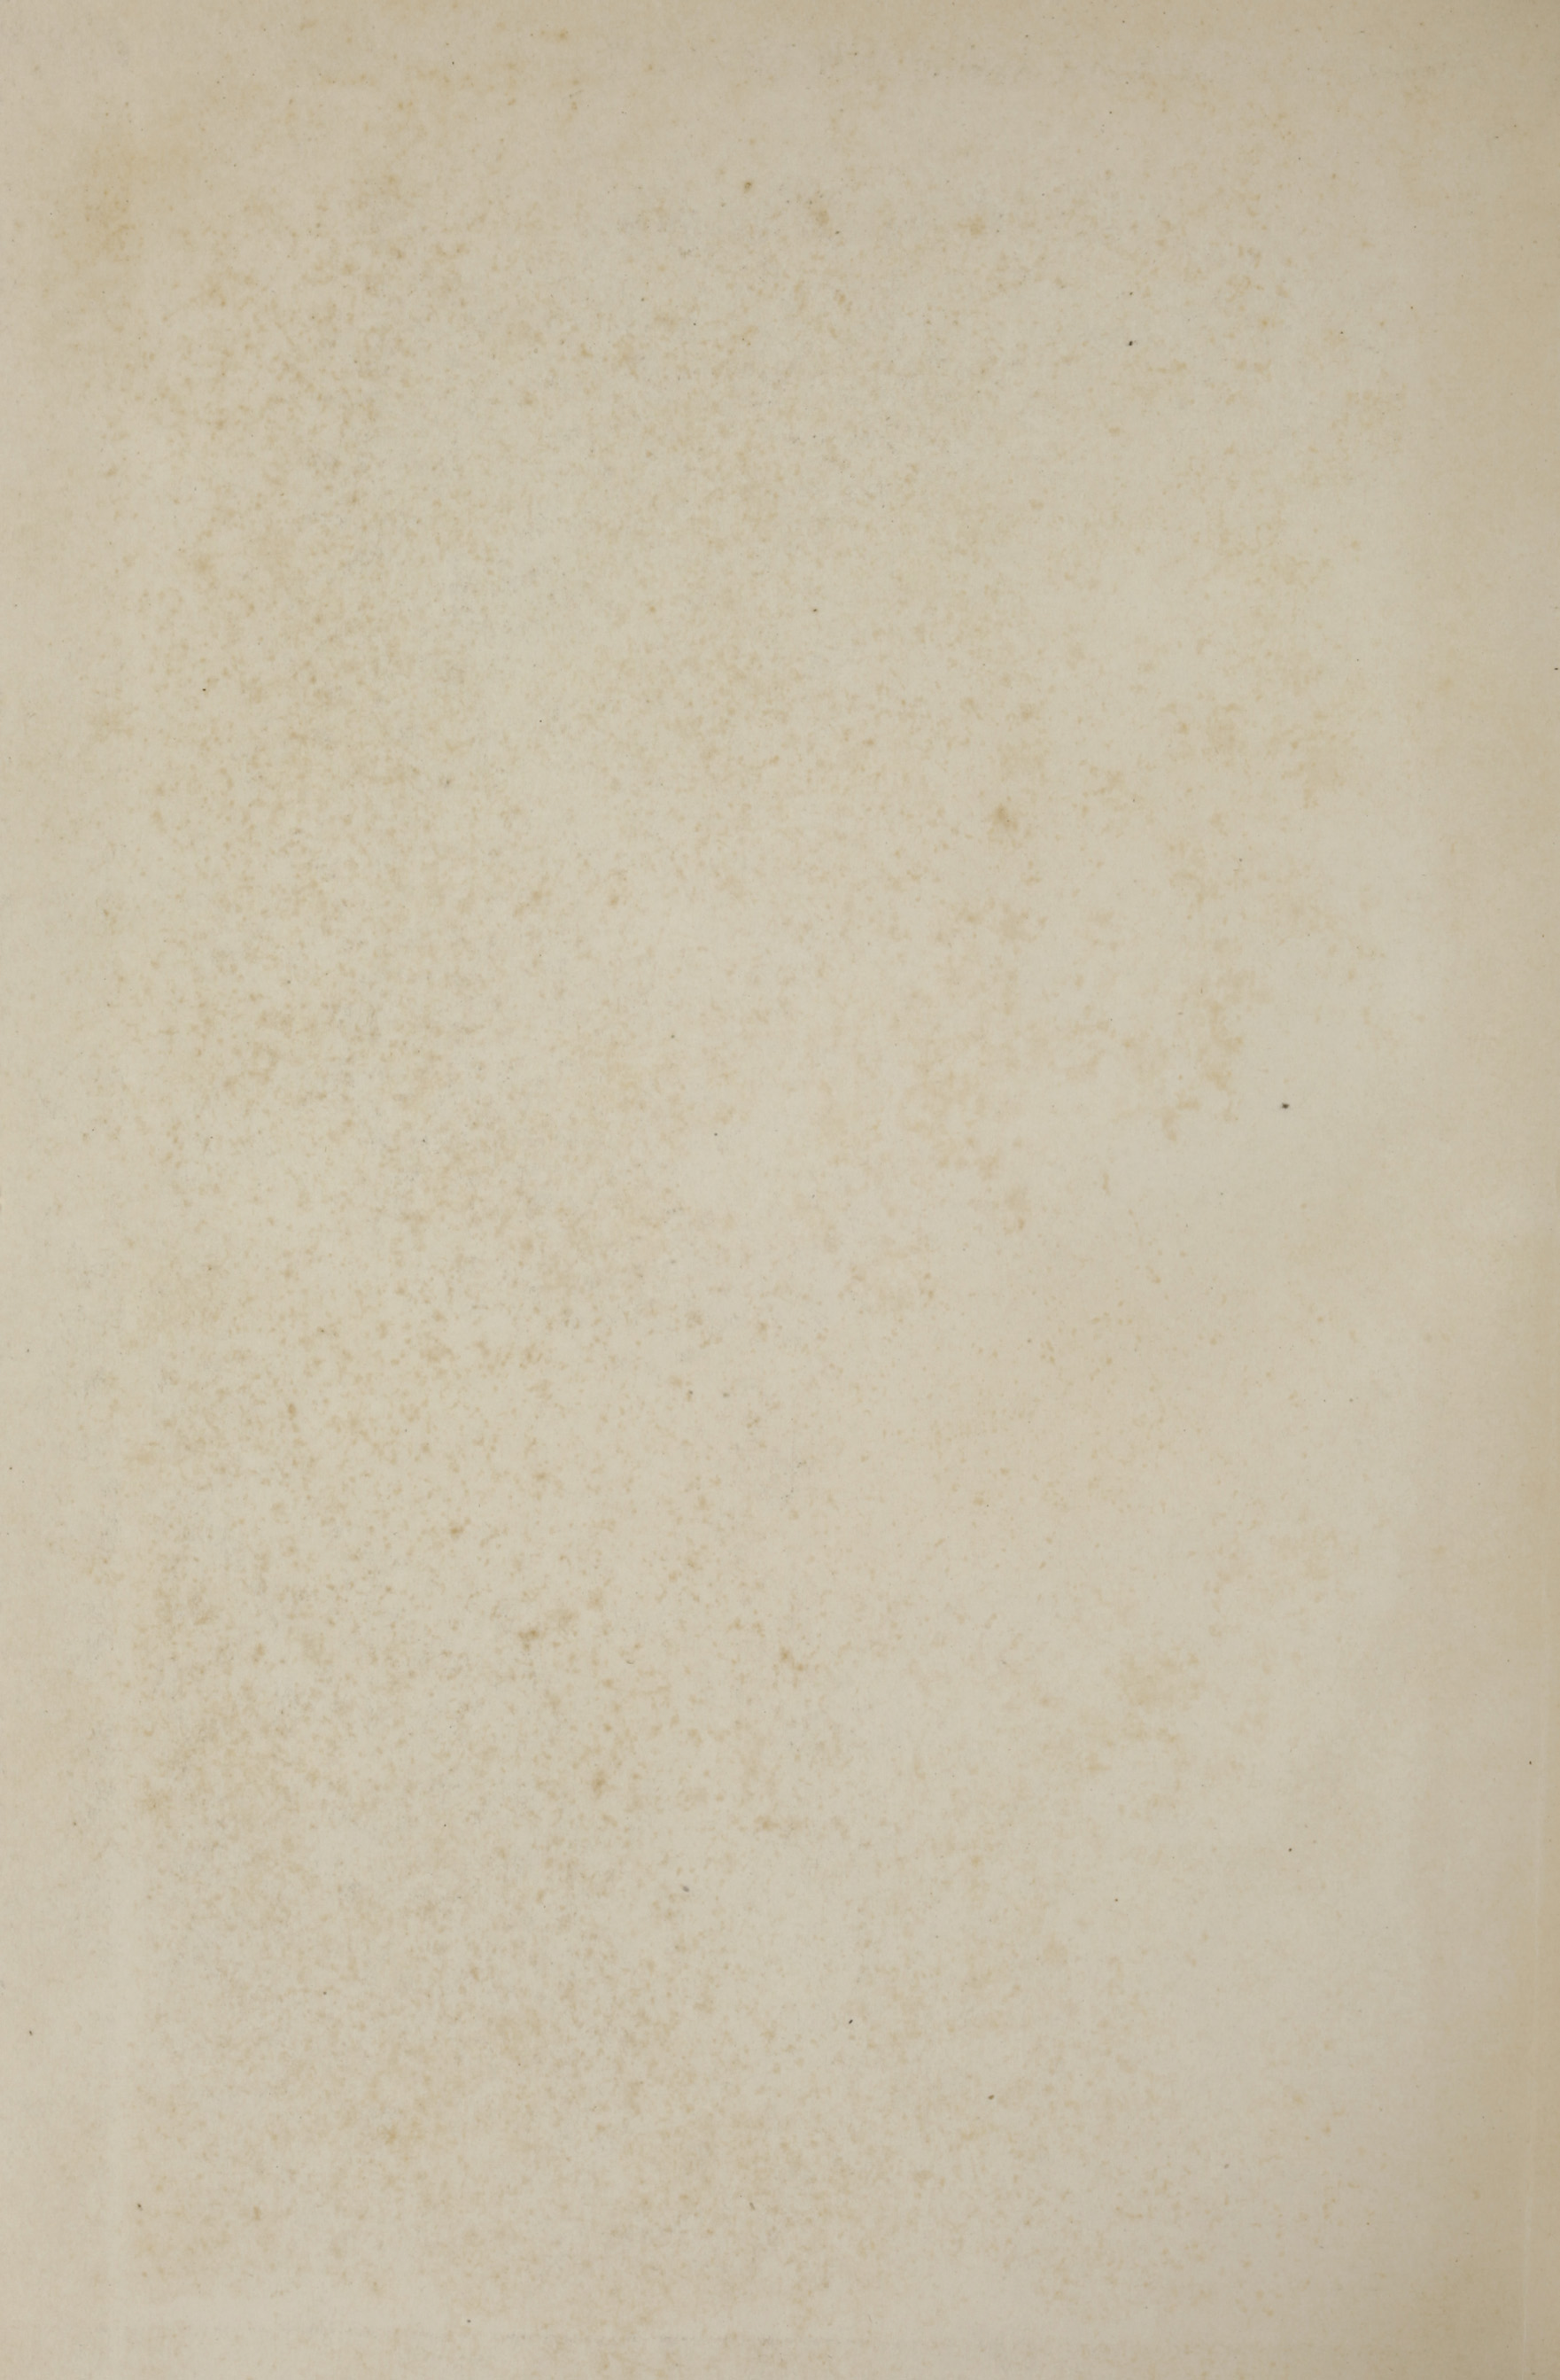 Charleston Yearbook, 1917, blank page